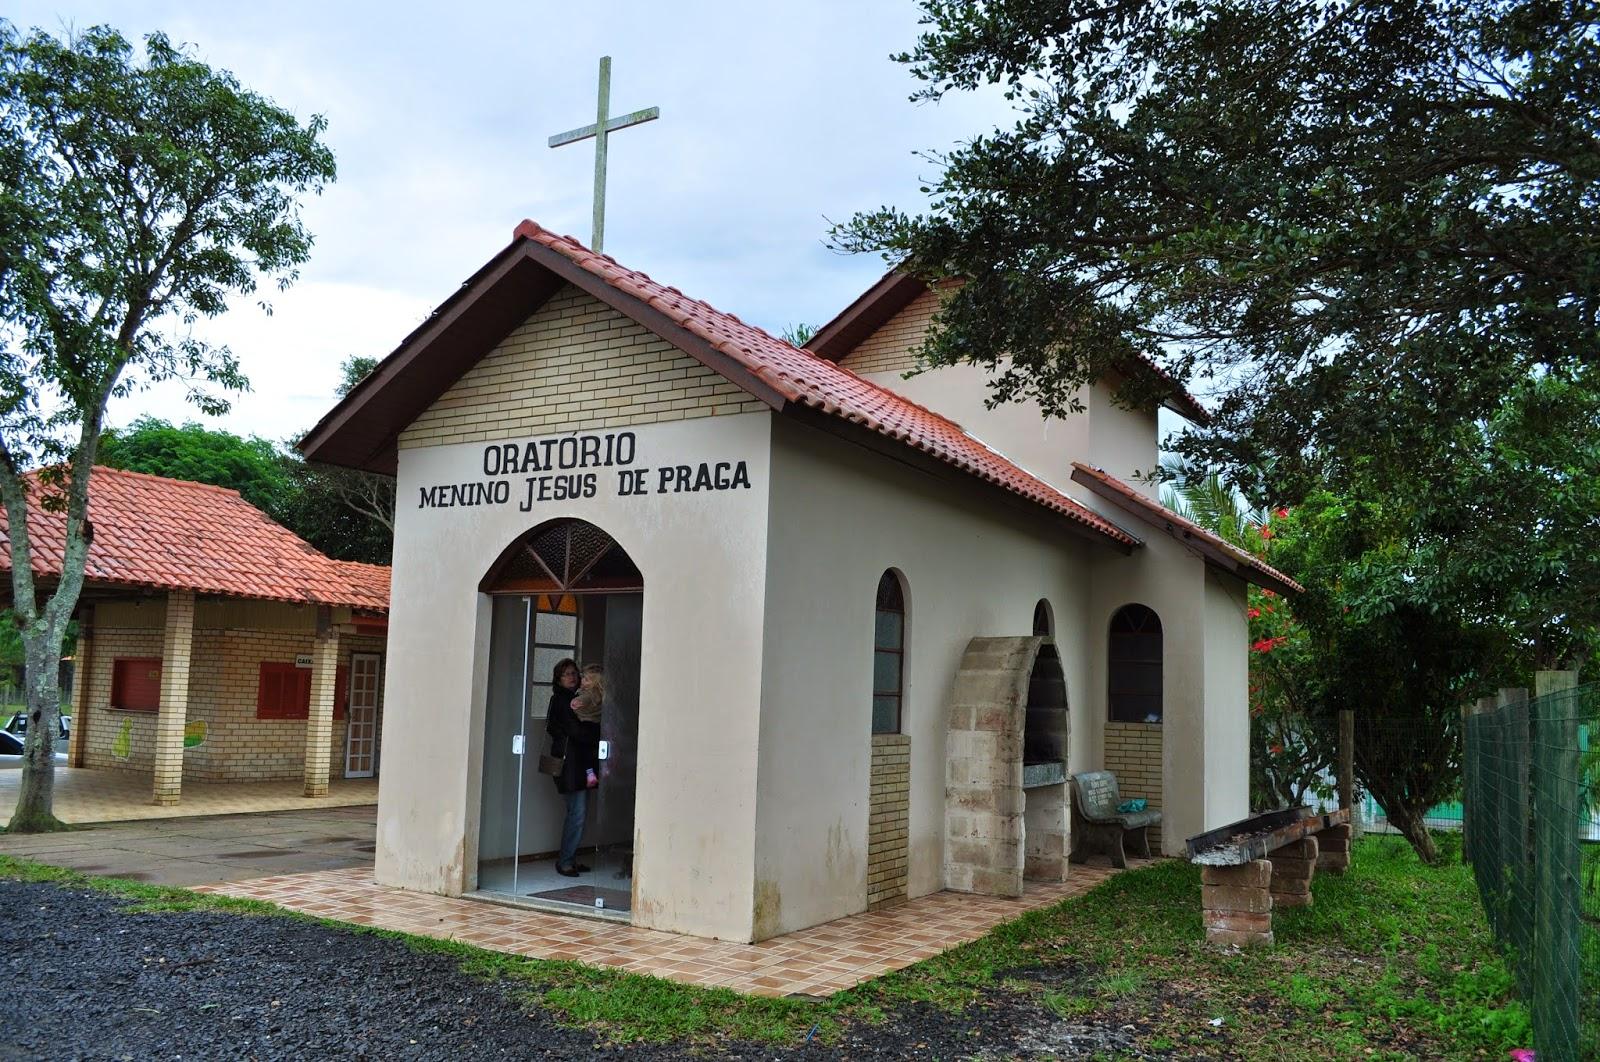 Oratorio_Menino_JesusPraga_Ararangua_FotoVicenzoBerti